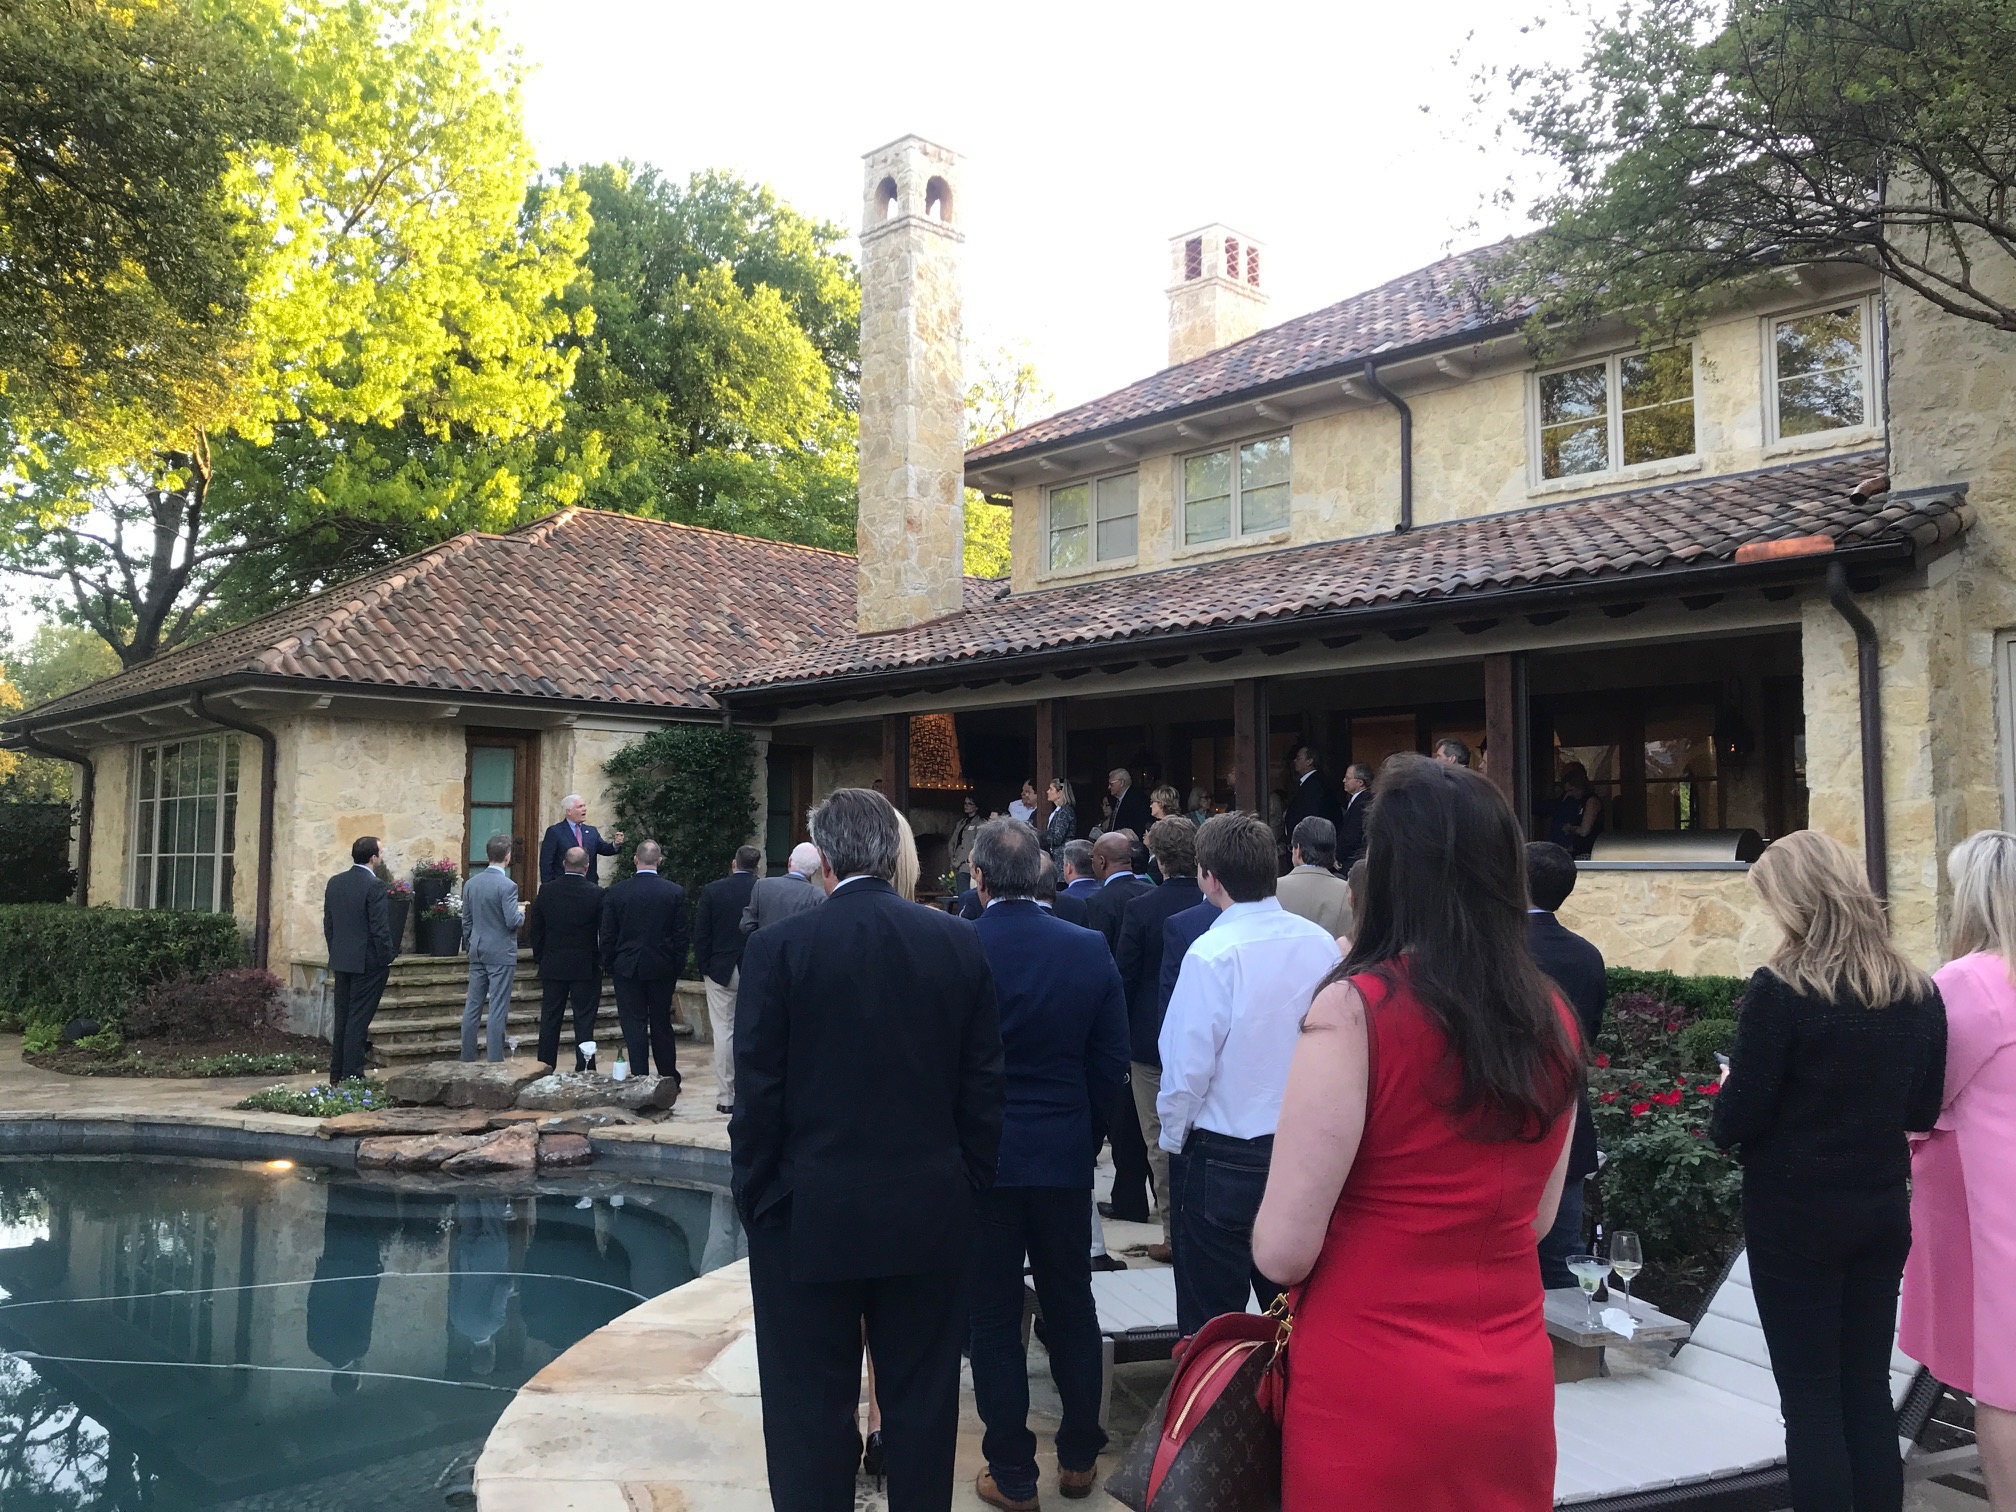 Fundraising reception in Dallas for Congressman Pete Sessions on April 4, 2018.